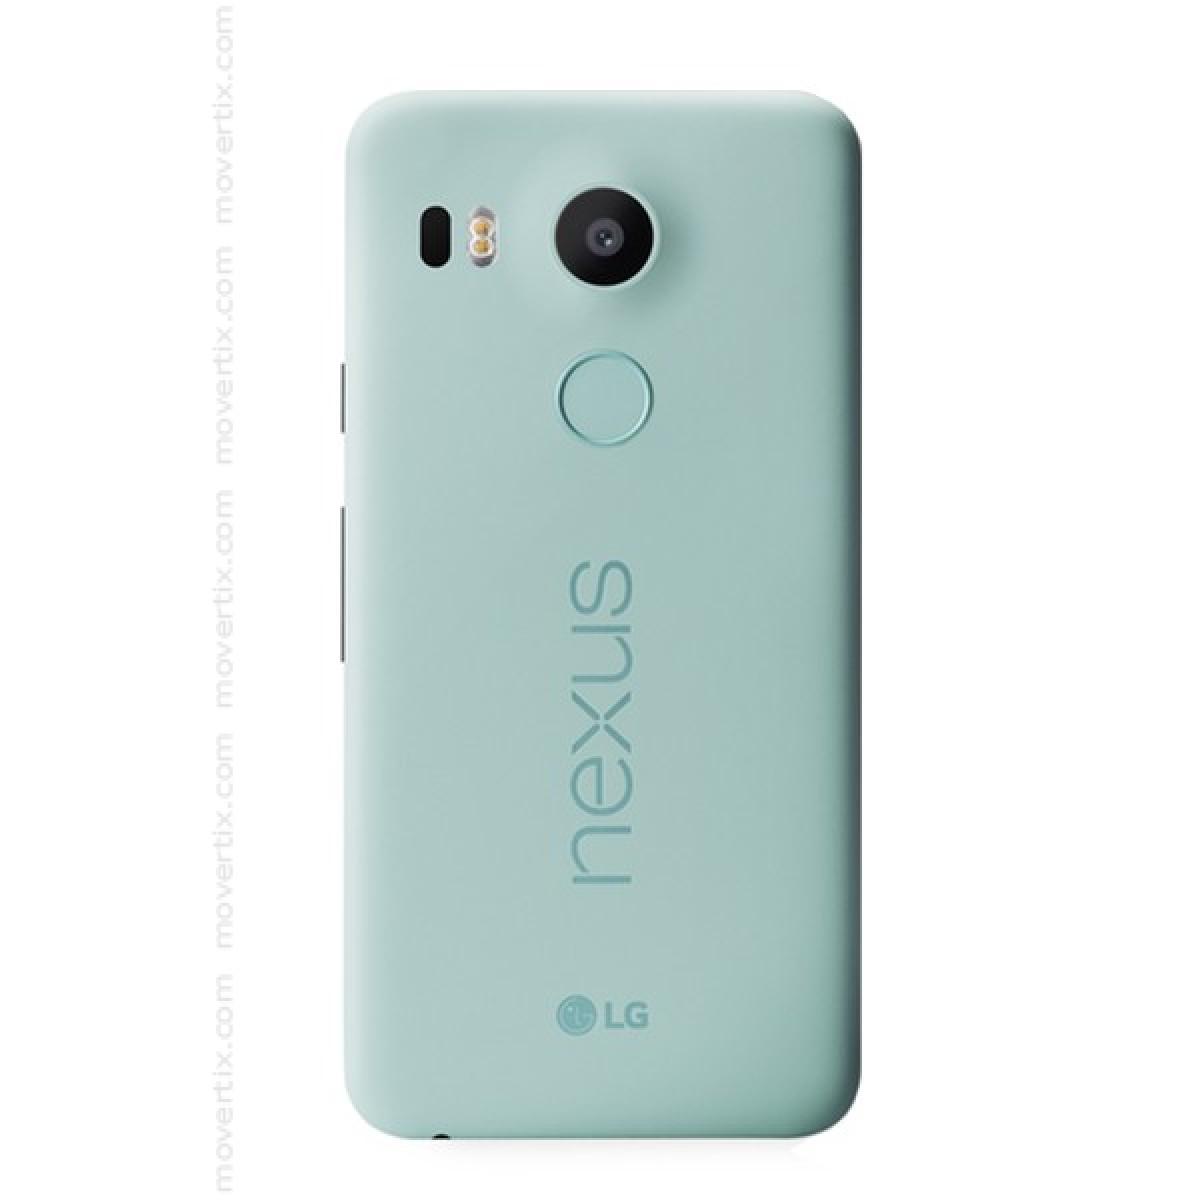 LG Google Nexus 5X Ice Blue 16GB 8806084999528